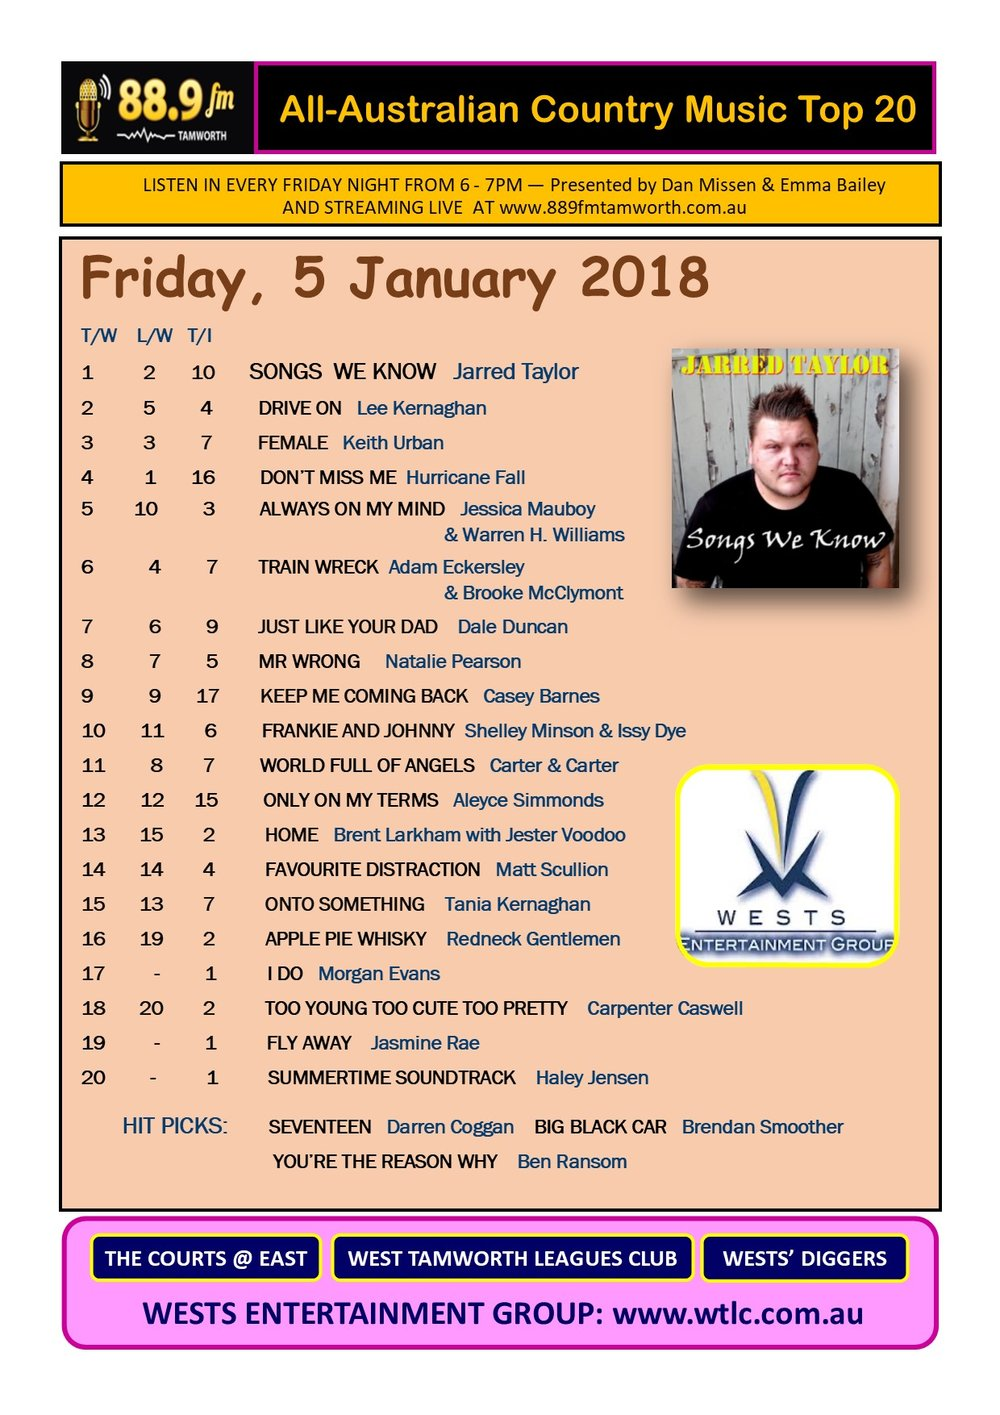 Australian Country Music Top 20 January 5 2018